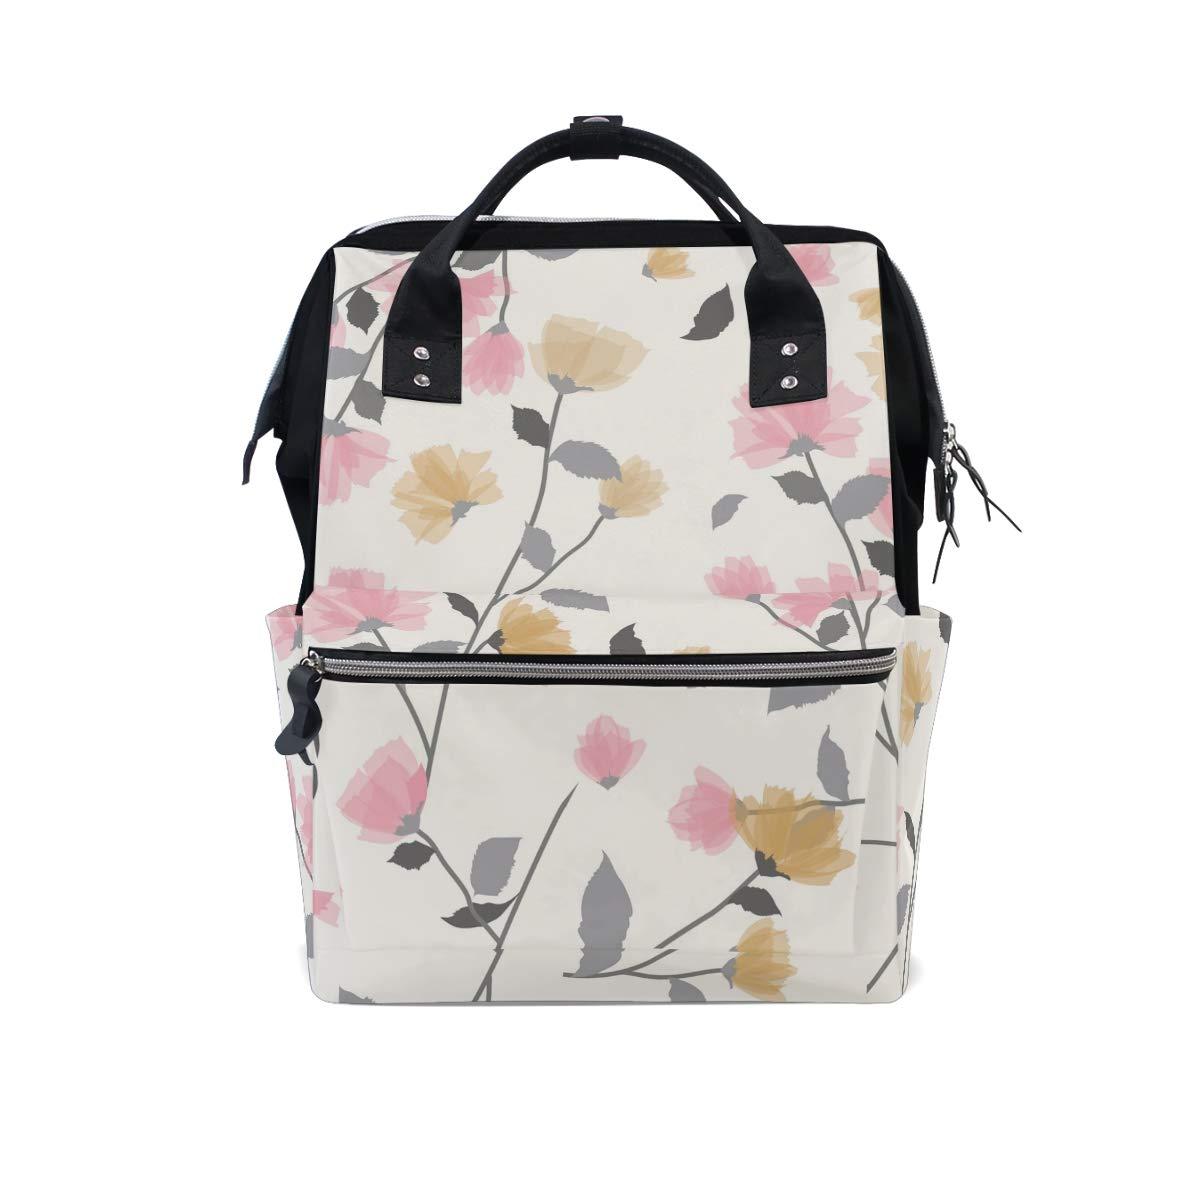 MERRYSUGAR Diaper Bag Backpack Cute Floral Flower Pink Multifunction Travel Bag